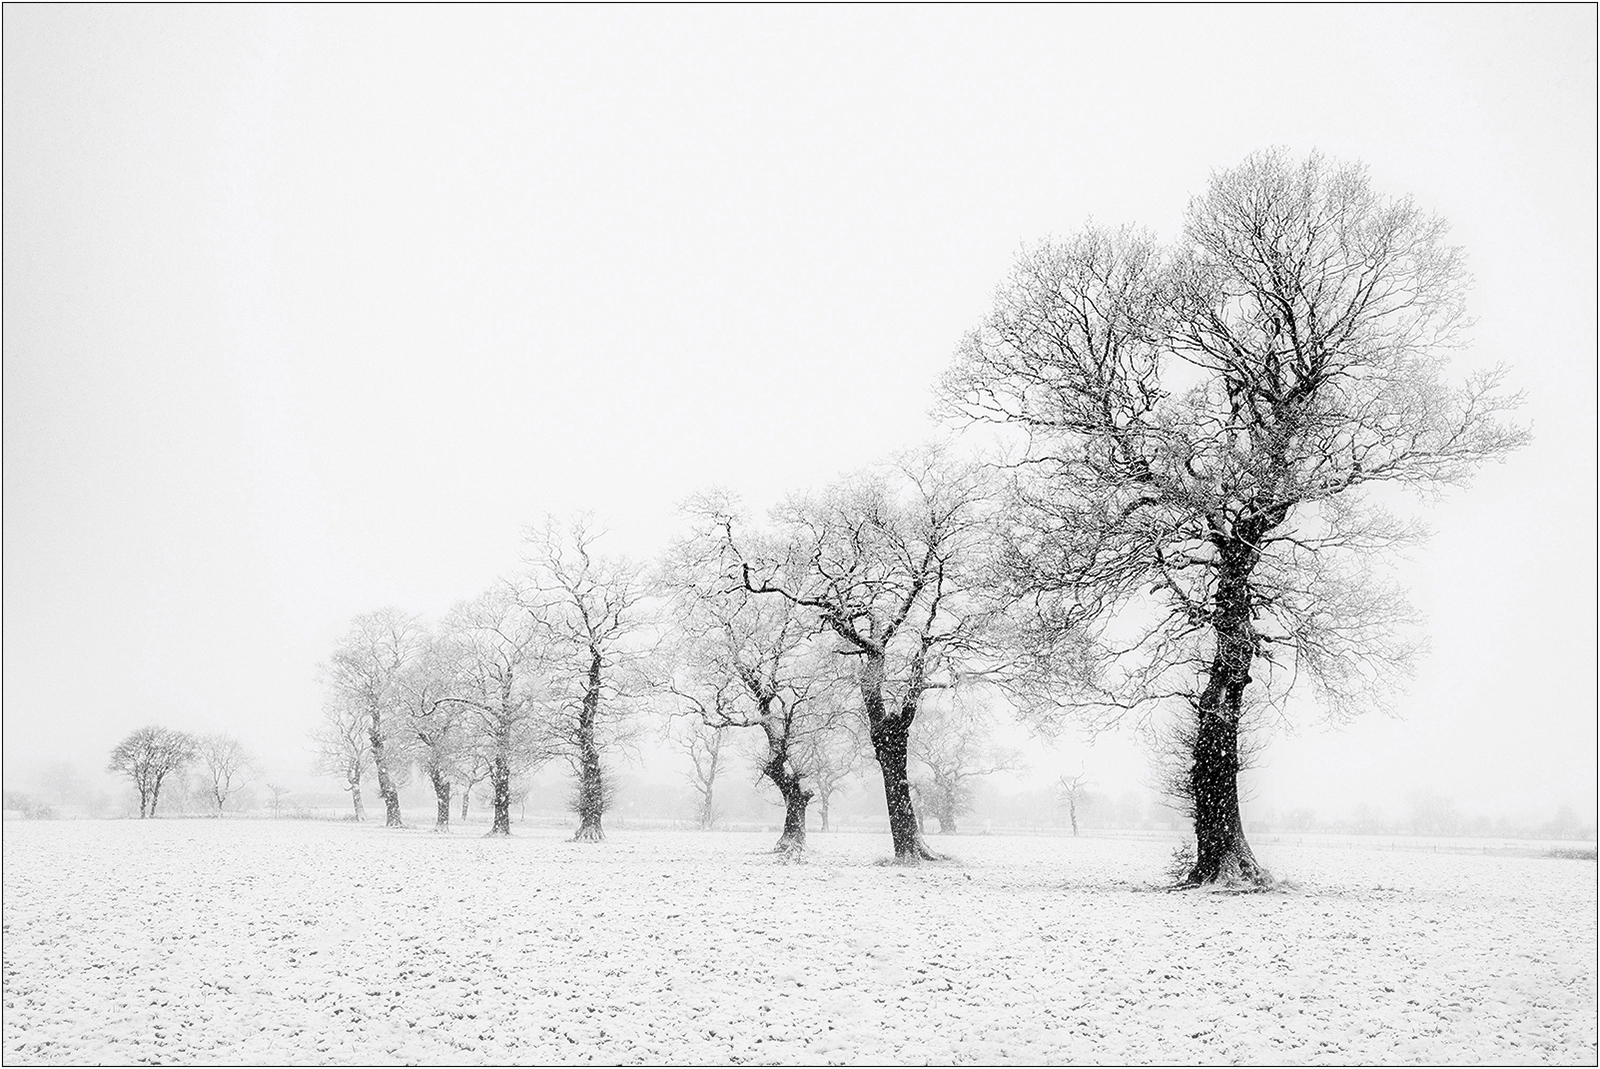 Tree-line-snow-storm_149